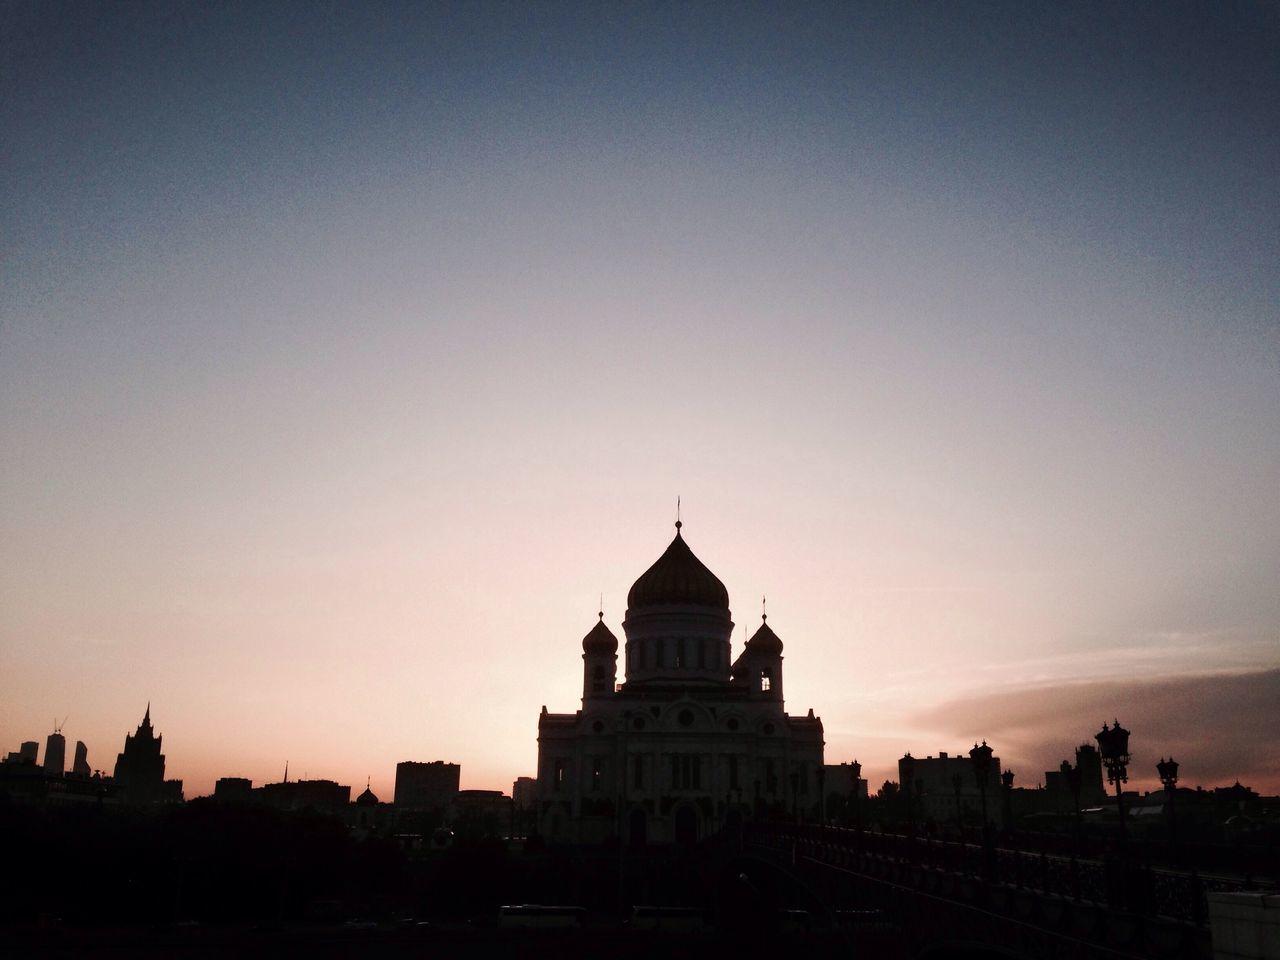 Church Moscow Russia Sky Sunset Q Eyeemphoto The City Light